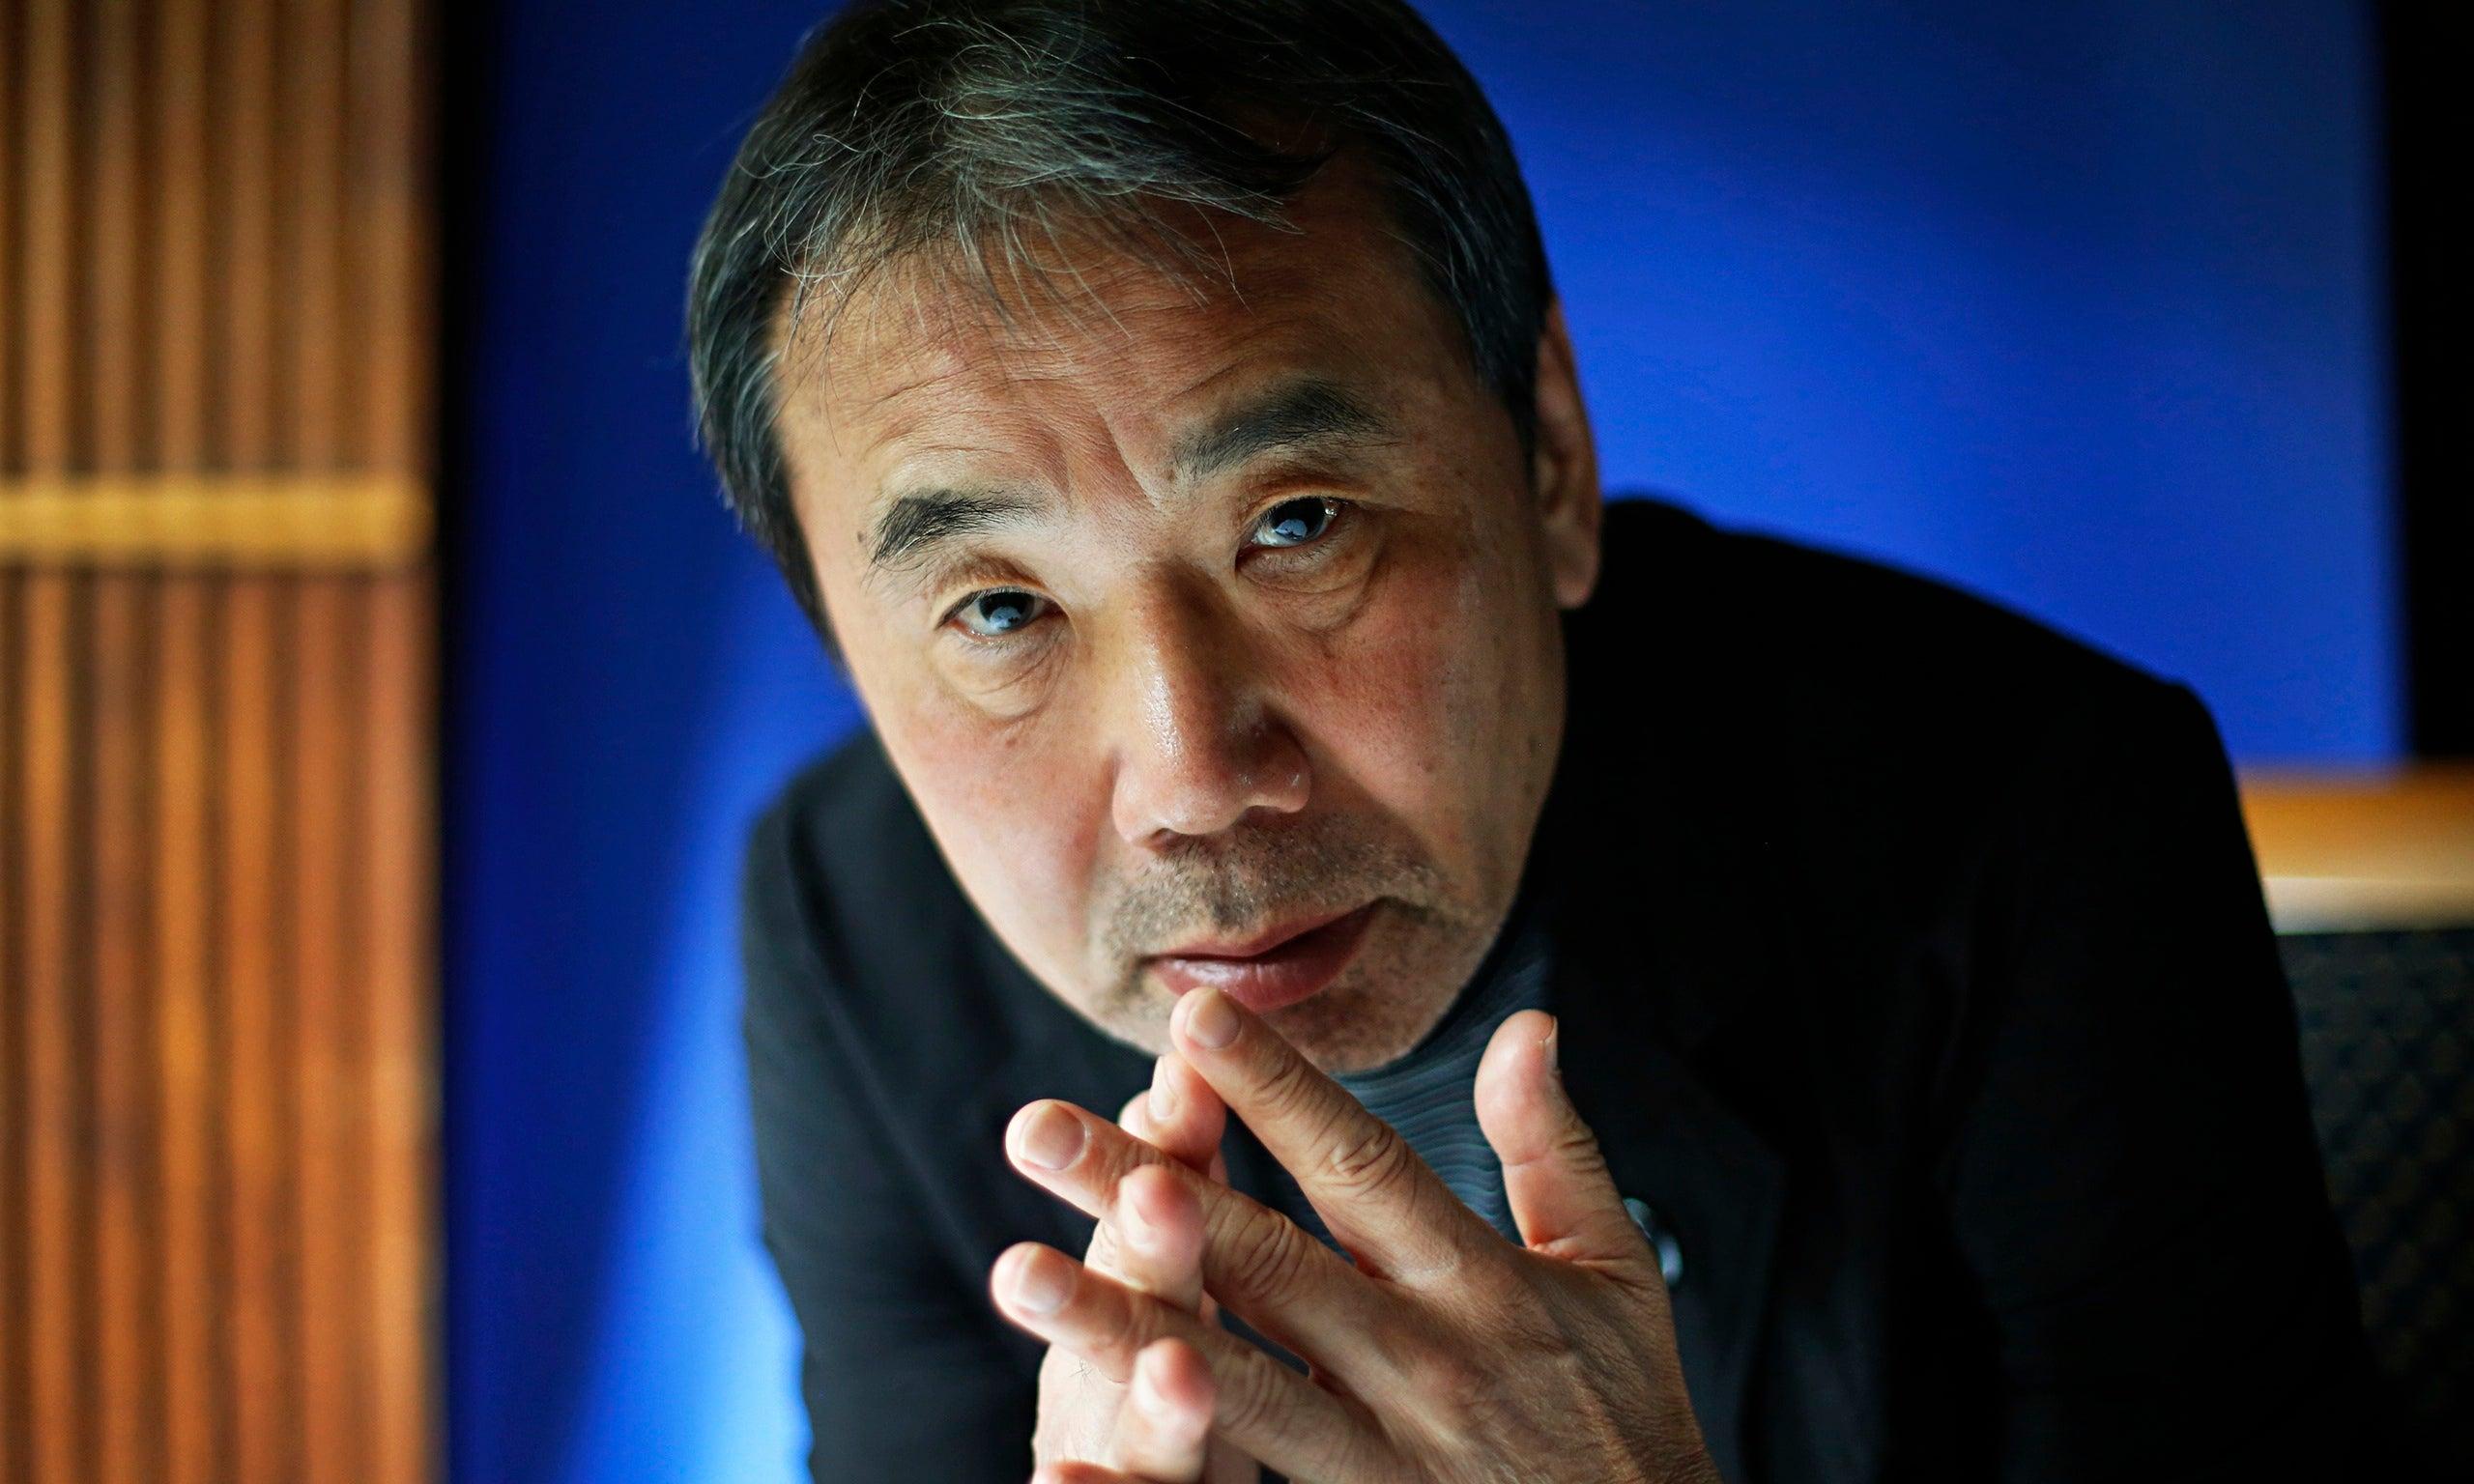 Haruki Murakami earned a  million dollar salary - leaving the net worth at 10 million in 2017